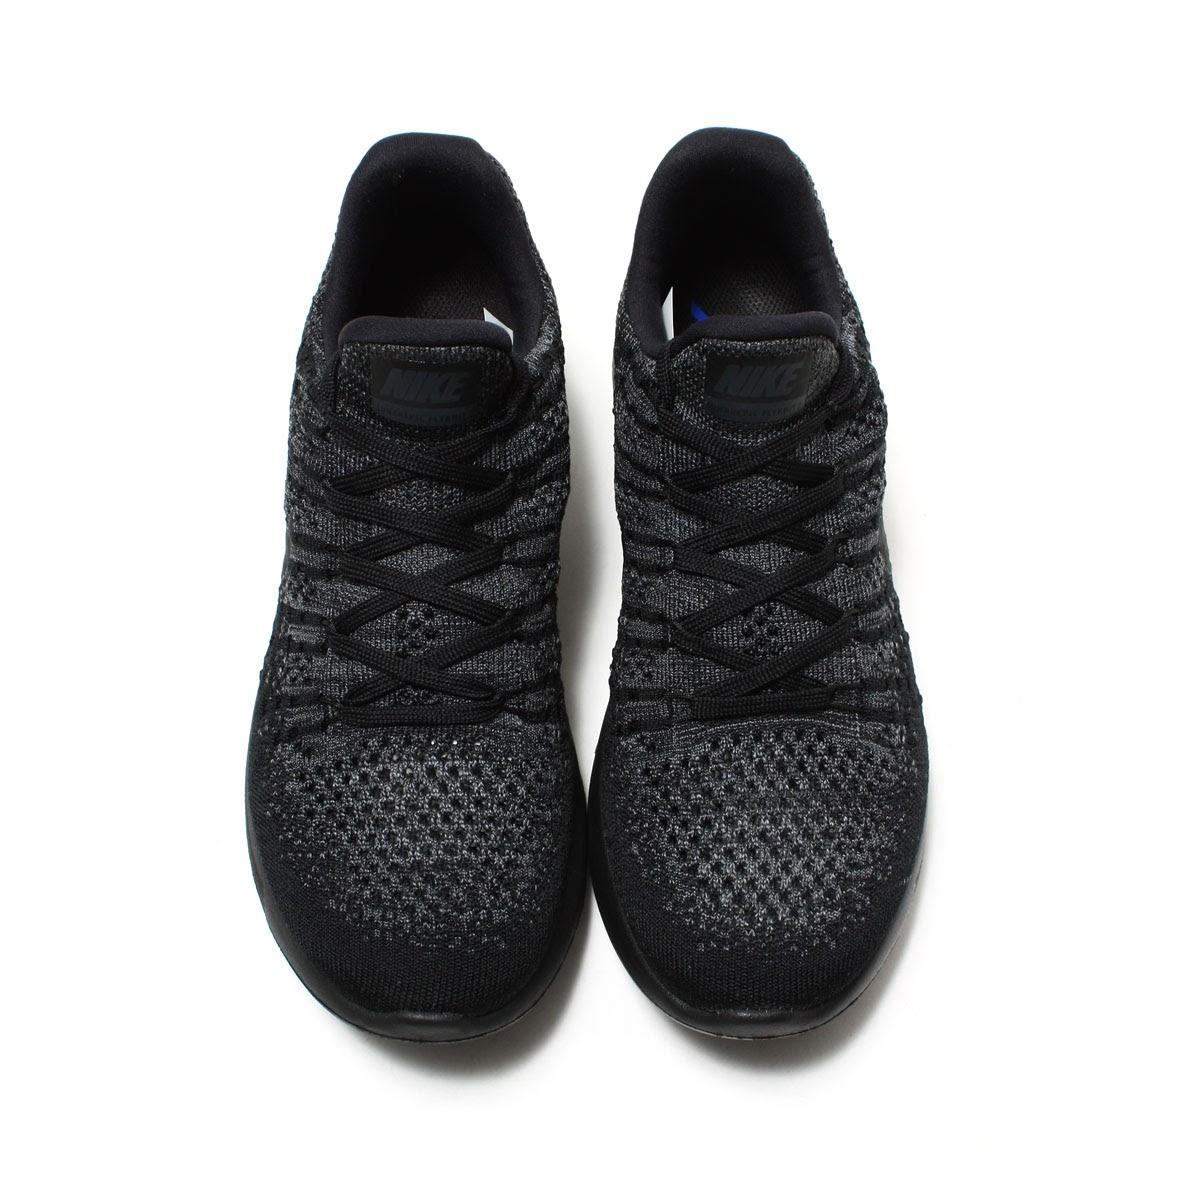 0c4fd9219109 NIKE W LUNAREPIC LOW FLYKNIT 2 (Nike women luna epic loaf rye knit 2) BLACK  BLACK-DARK GREY-RACER BLUE 17FA-I